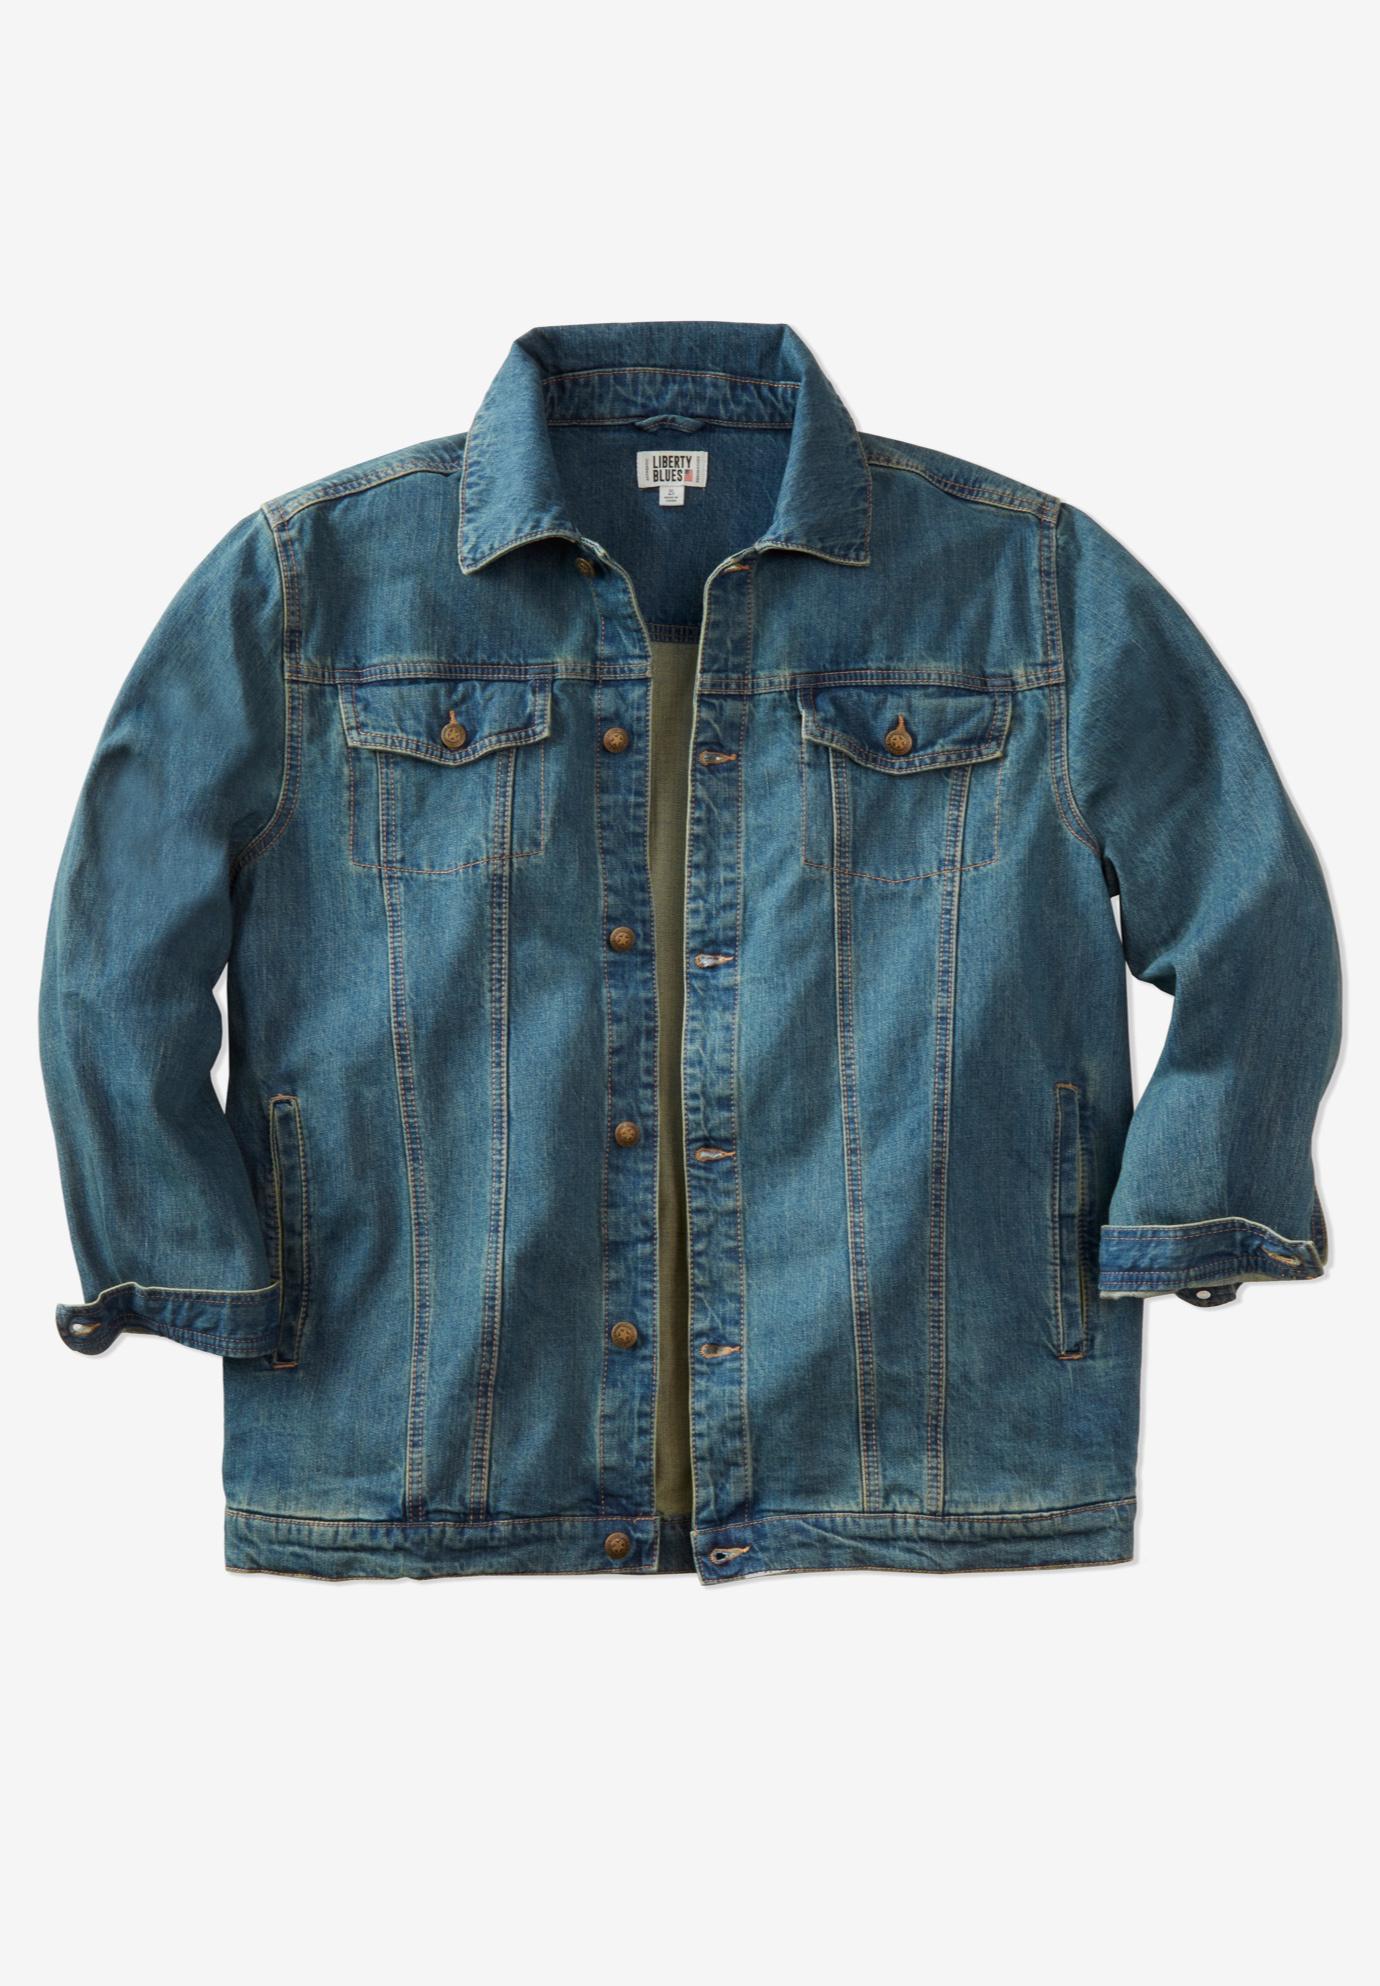 Denim Jacket By Liberty Blues 174 Plus Size Casual Jackets